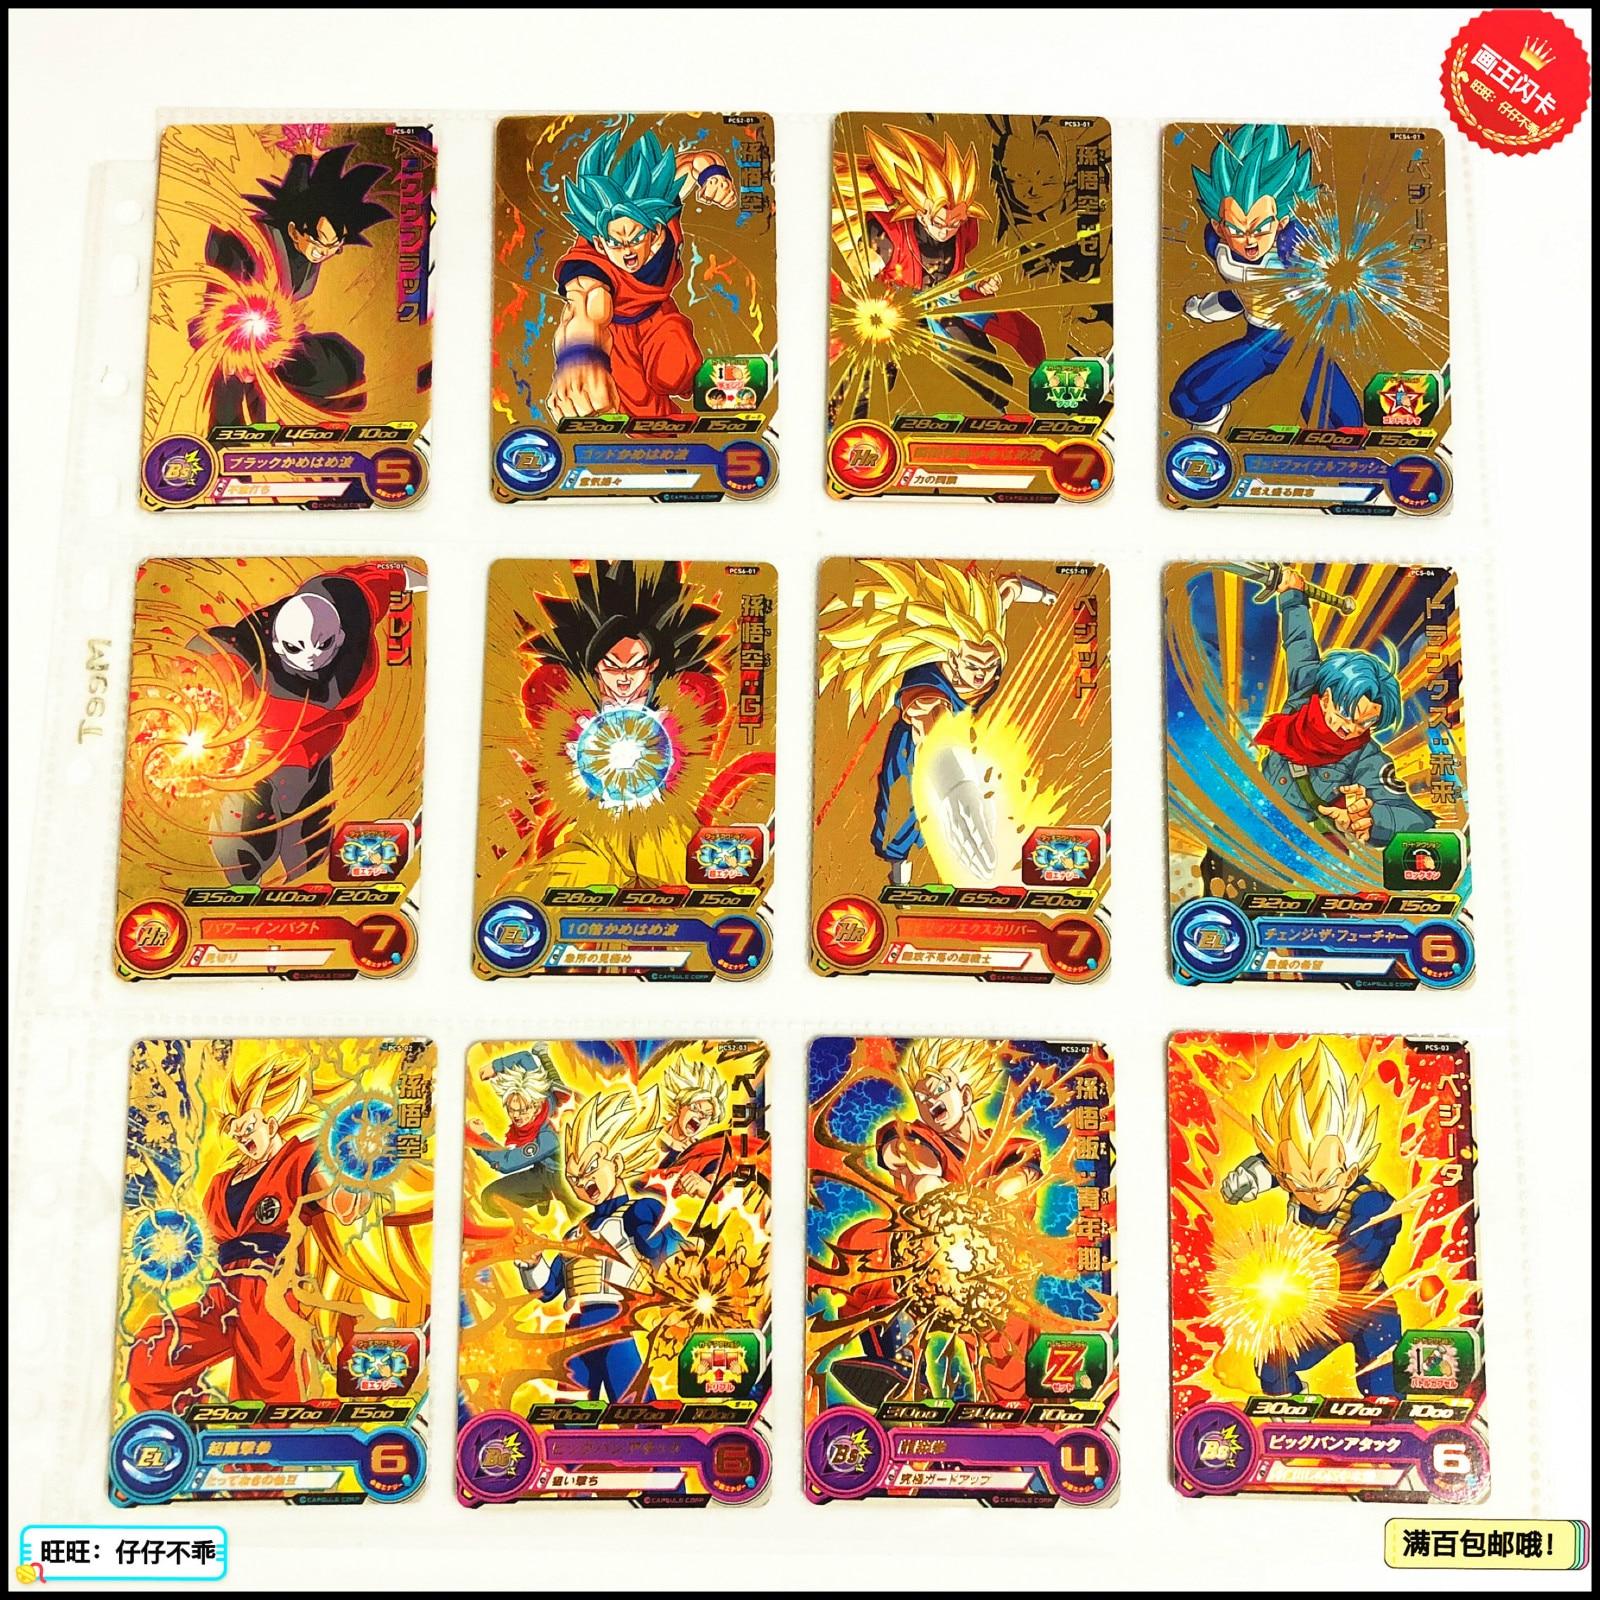 Japan Original Dragon Ball  PCS1-7 Anniversary God Super Saiyan Goku Toys Hobbies Collectibles Game Collection Anime Cards